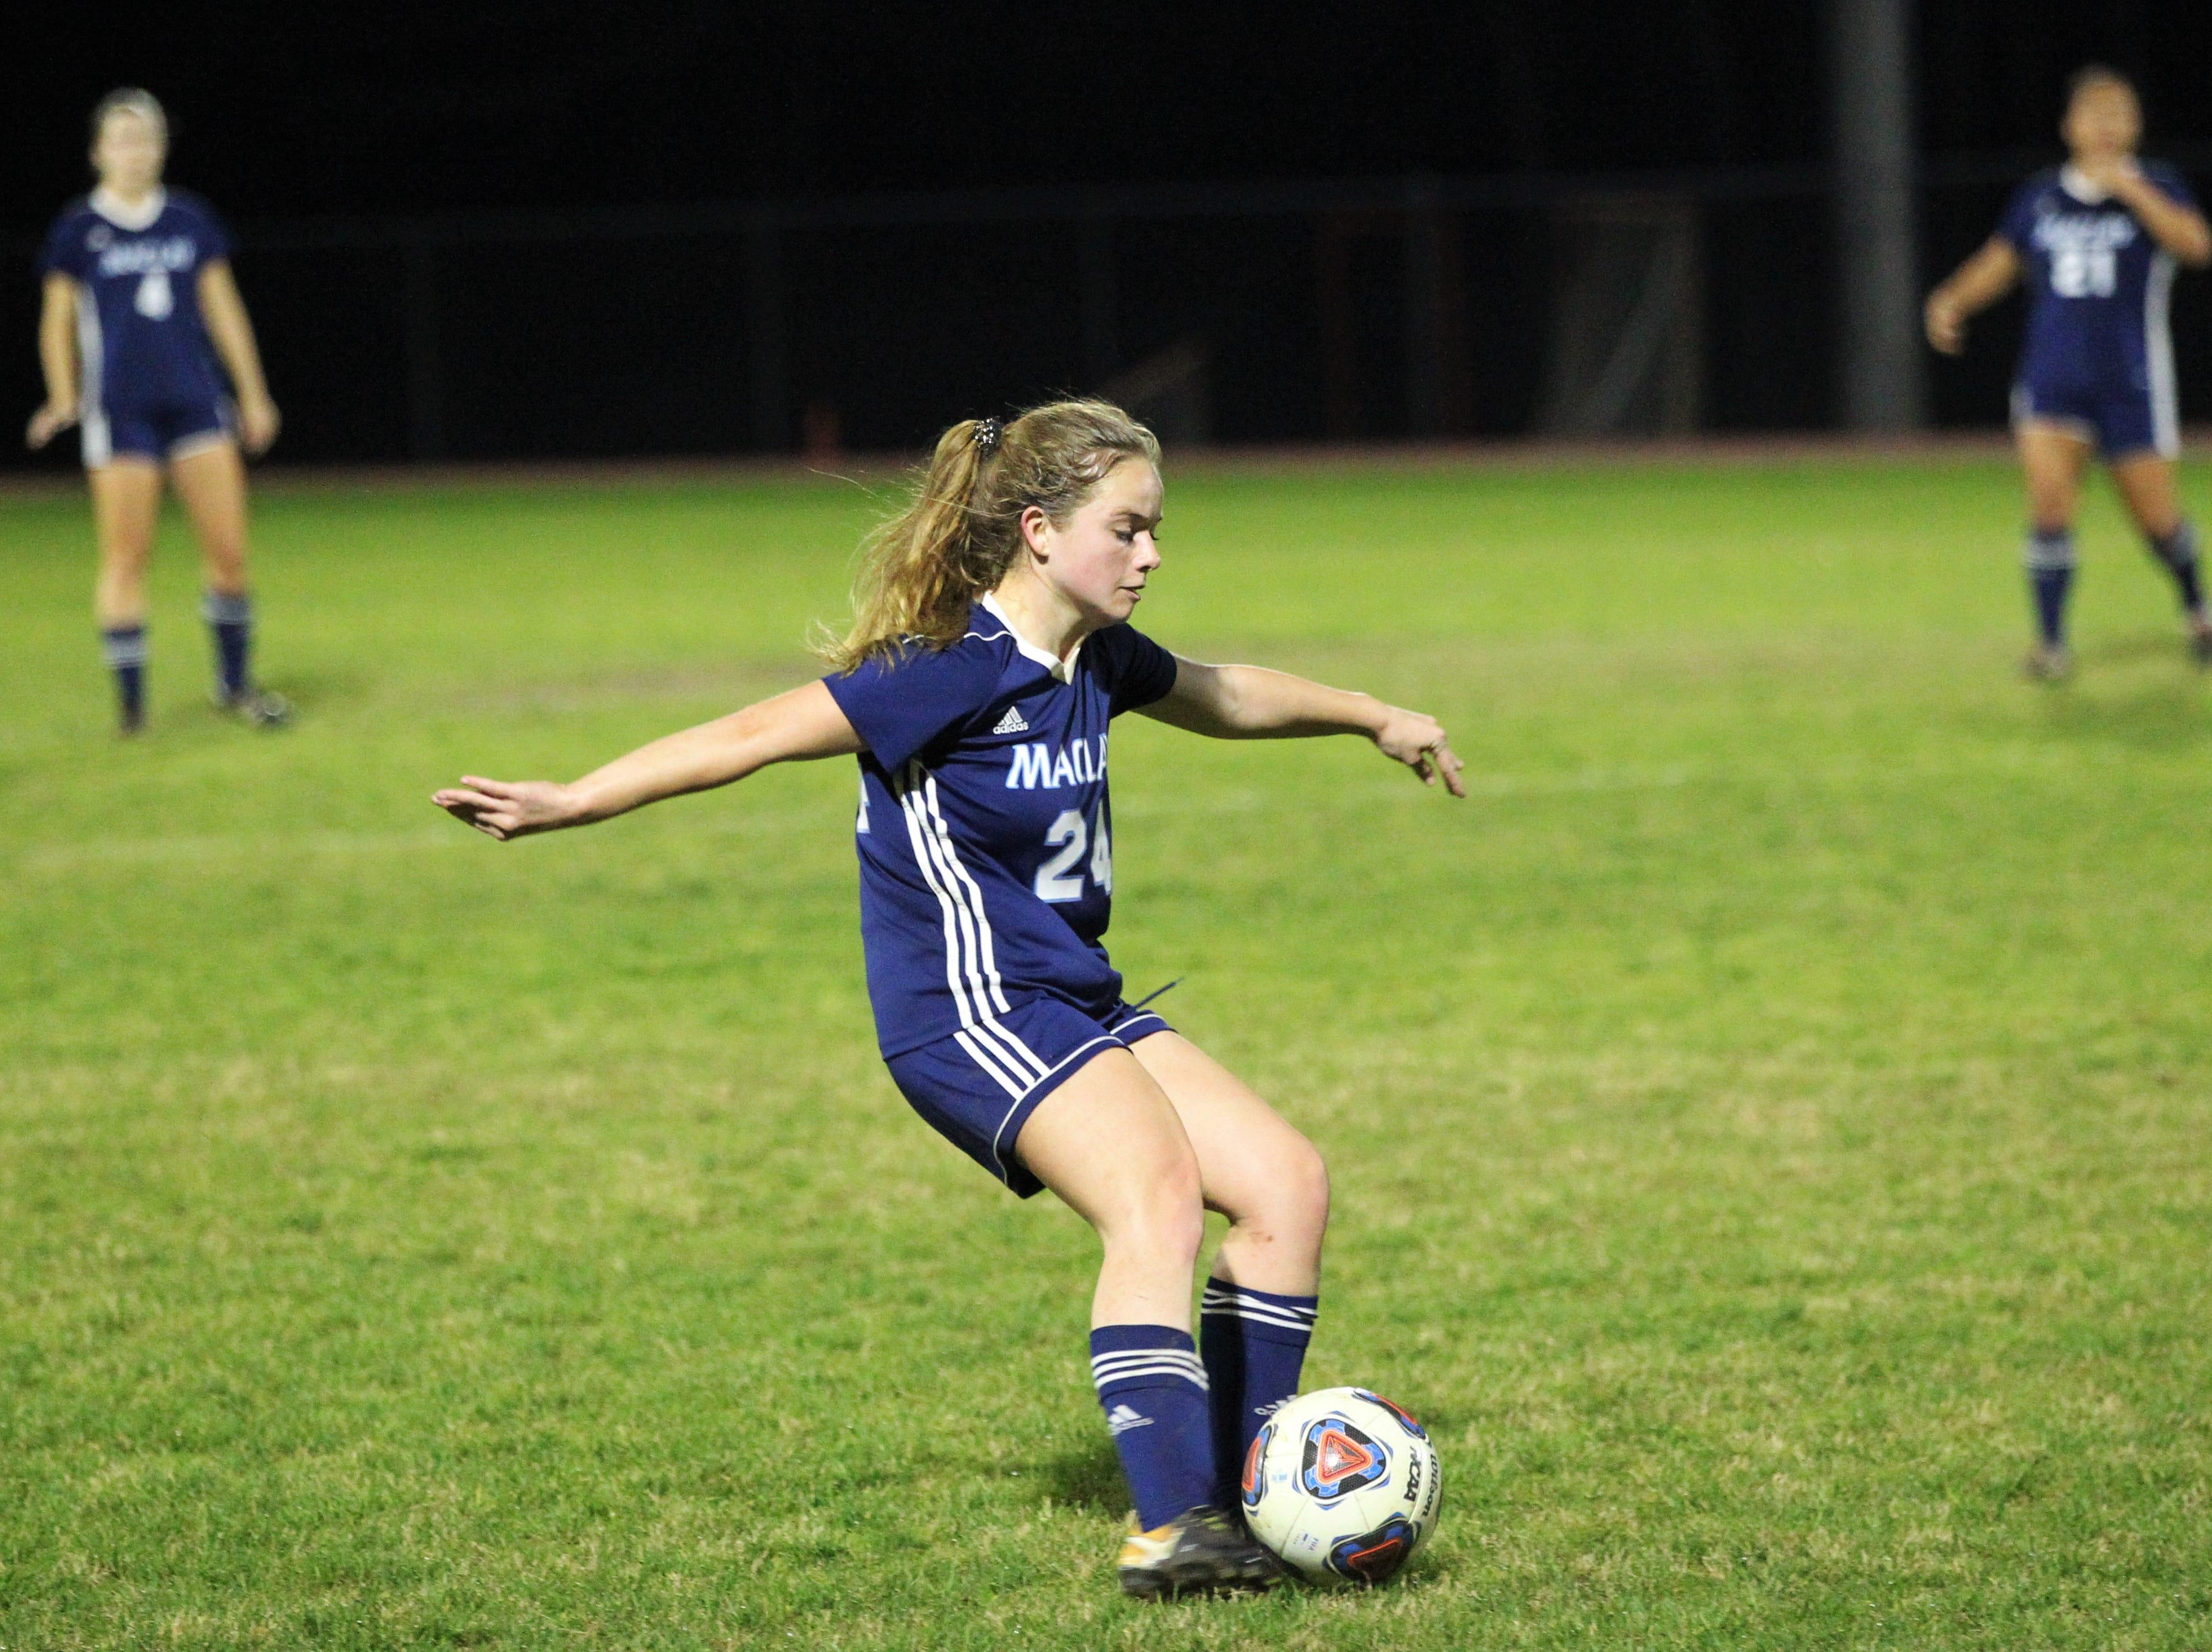 Maclay's Lauren Dessi takes a free kick as Maclay's girls soccer team beat St. Joseph Academy 4-0 in a Region 1-1A quarterfinal on Jan. 5, 2019.